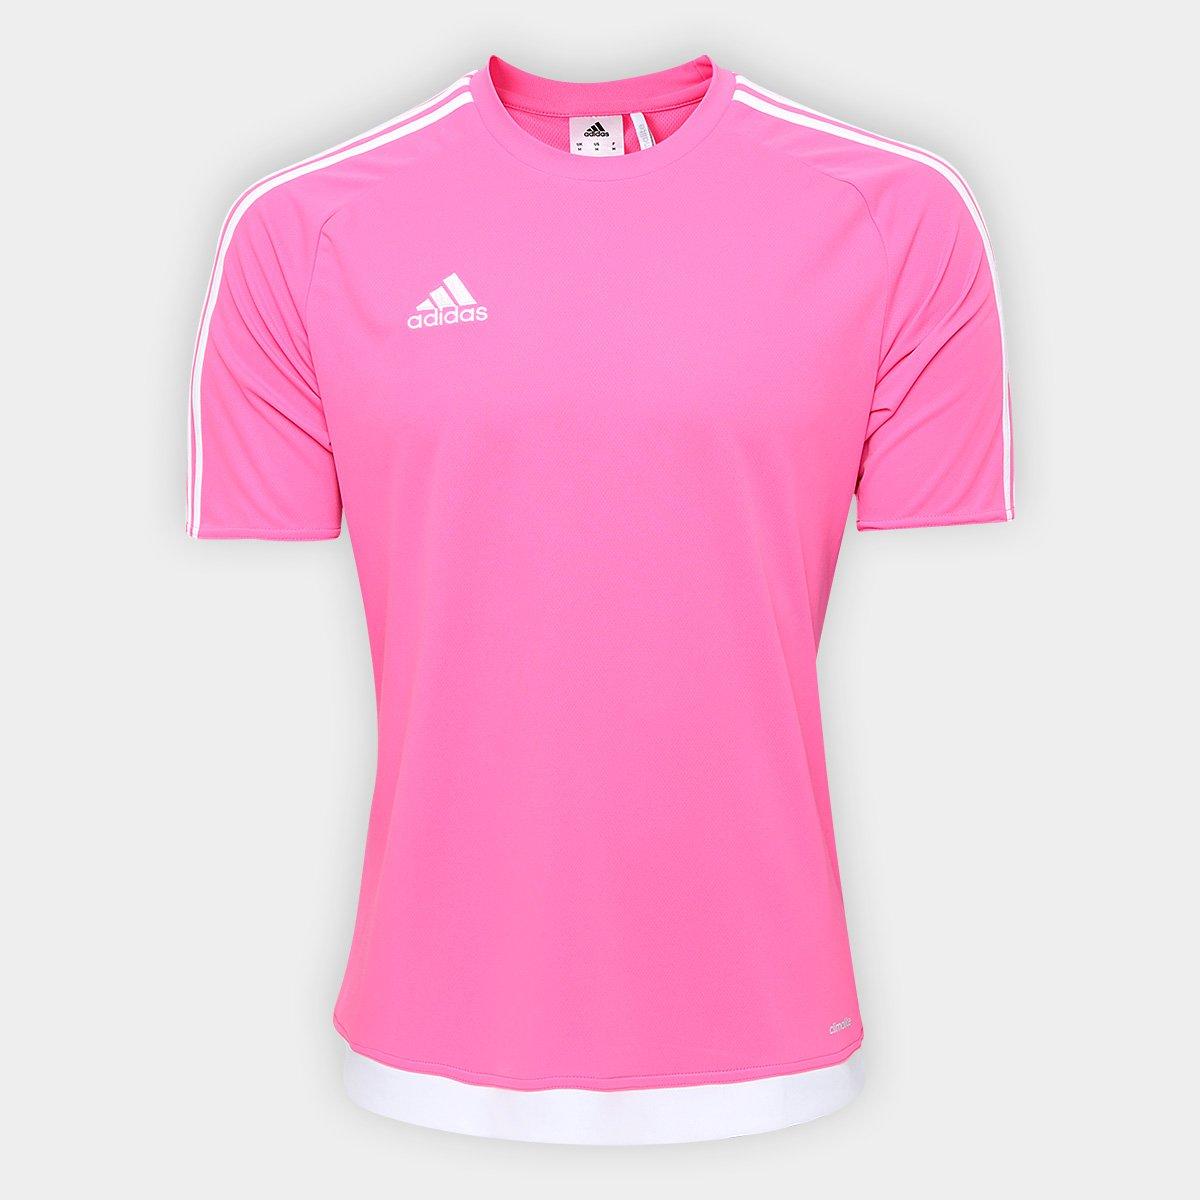 Camisa Adidas Estro 15 Masculina - Rosa e Branco - Compre Agora ... 92f3baed0aee4